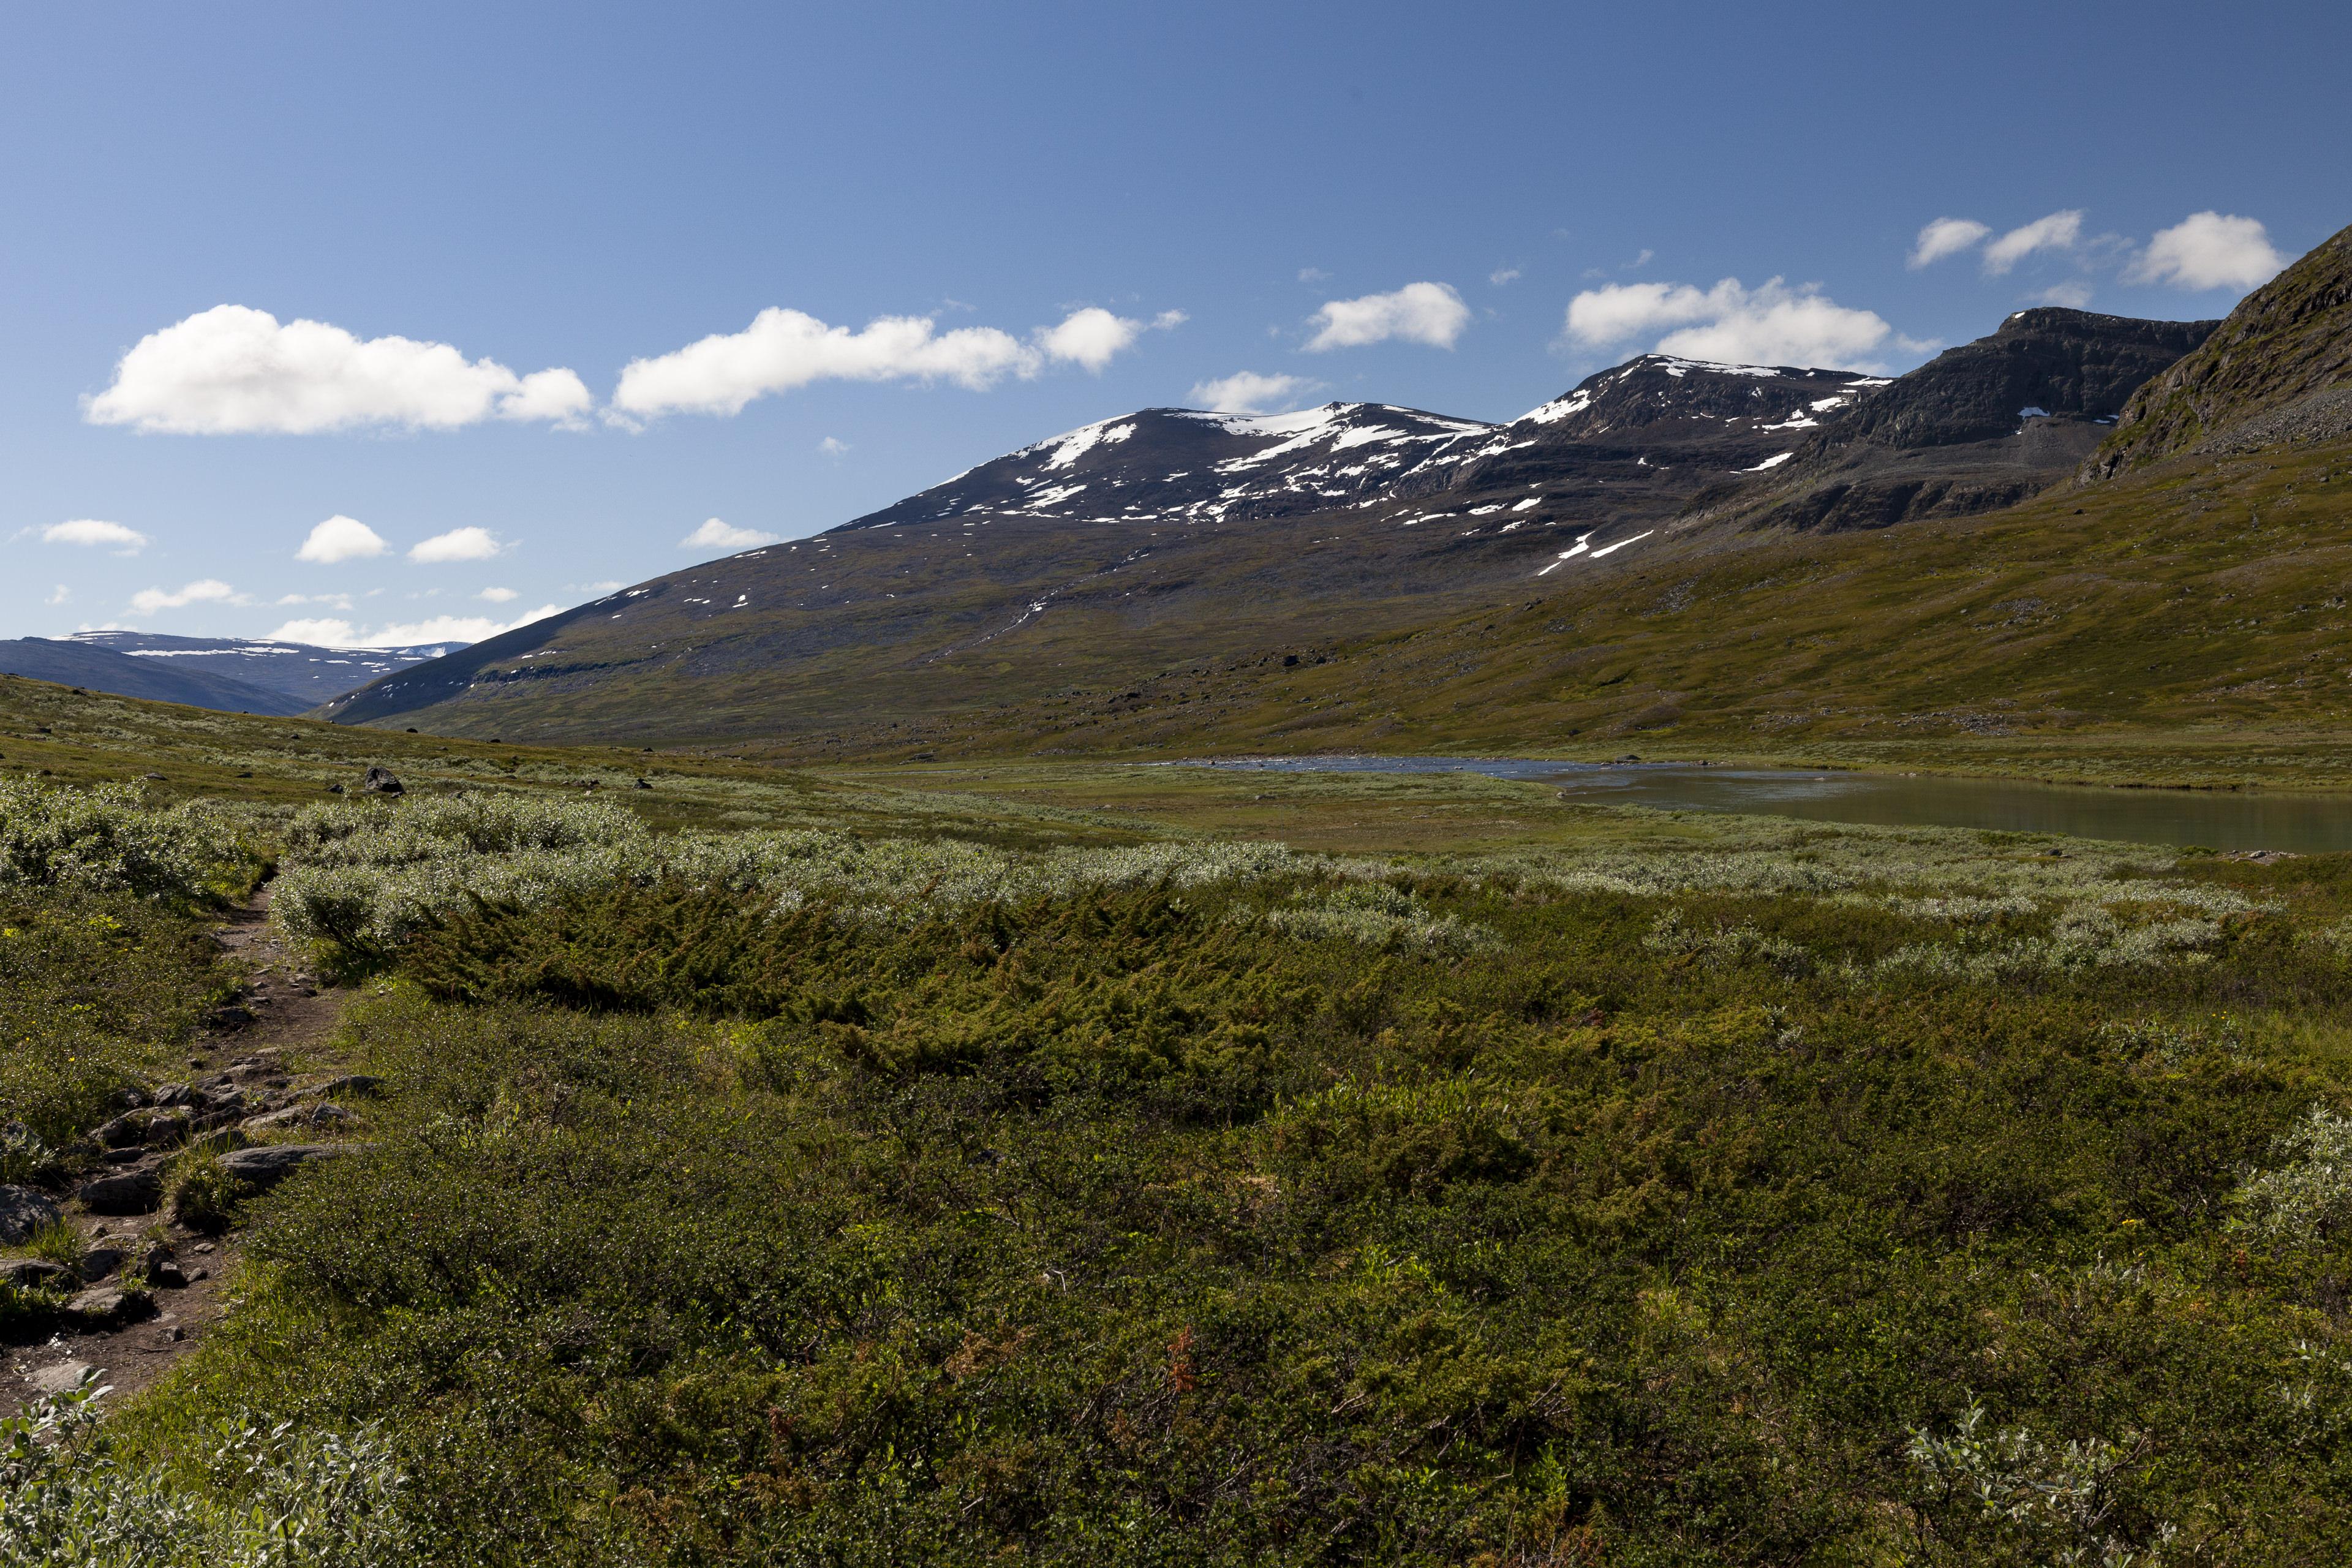 Die Richtung stimmt, Kaitumjaure liegt am Fuß des Sánarčohkka (1580m),©Markus Proske—Canon EOS 5D Mark II, EF16-35mm f/4L IS USM, 35mm, 1/160s, Blende 11, ISO 200